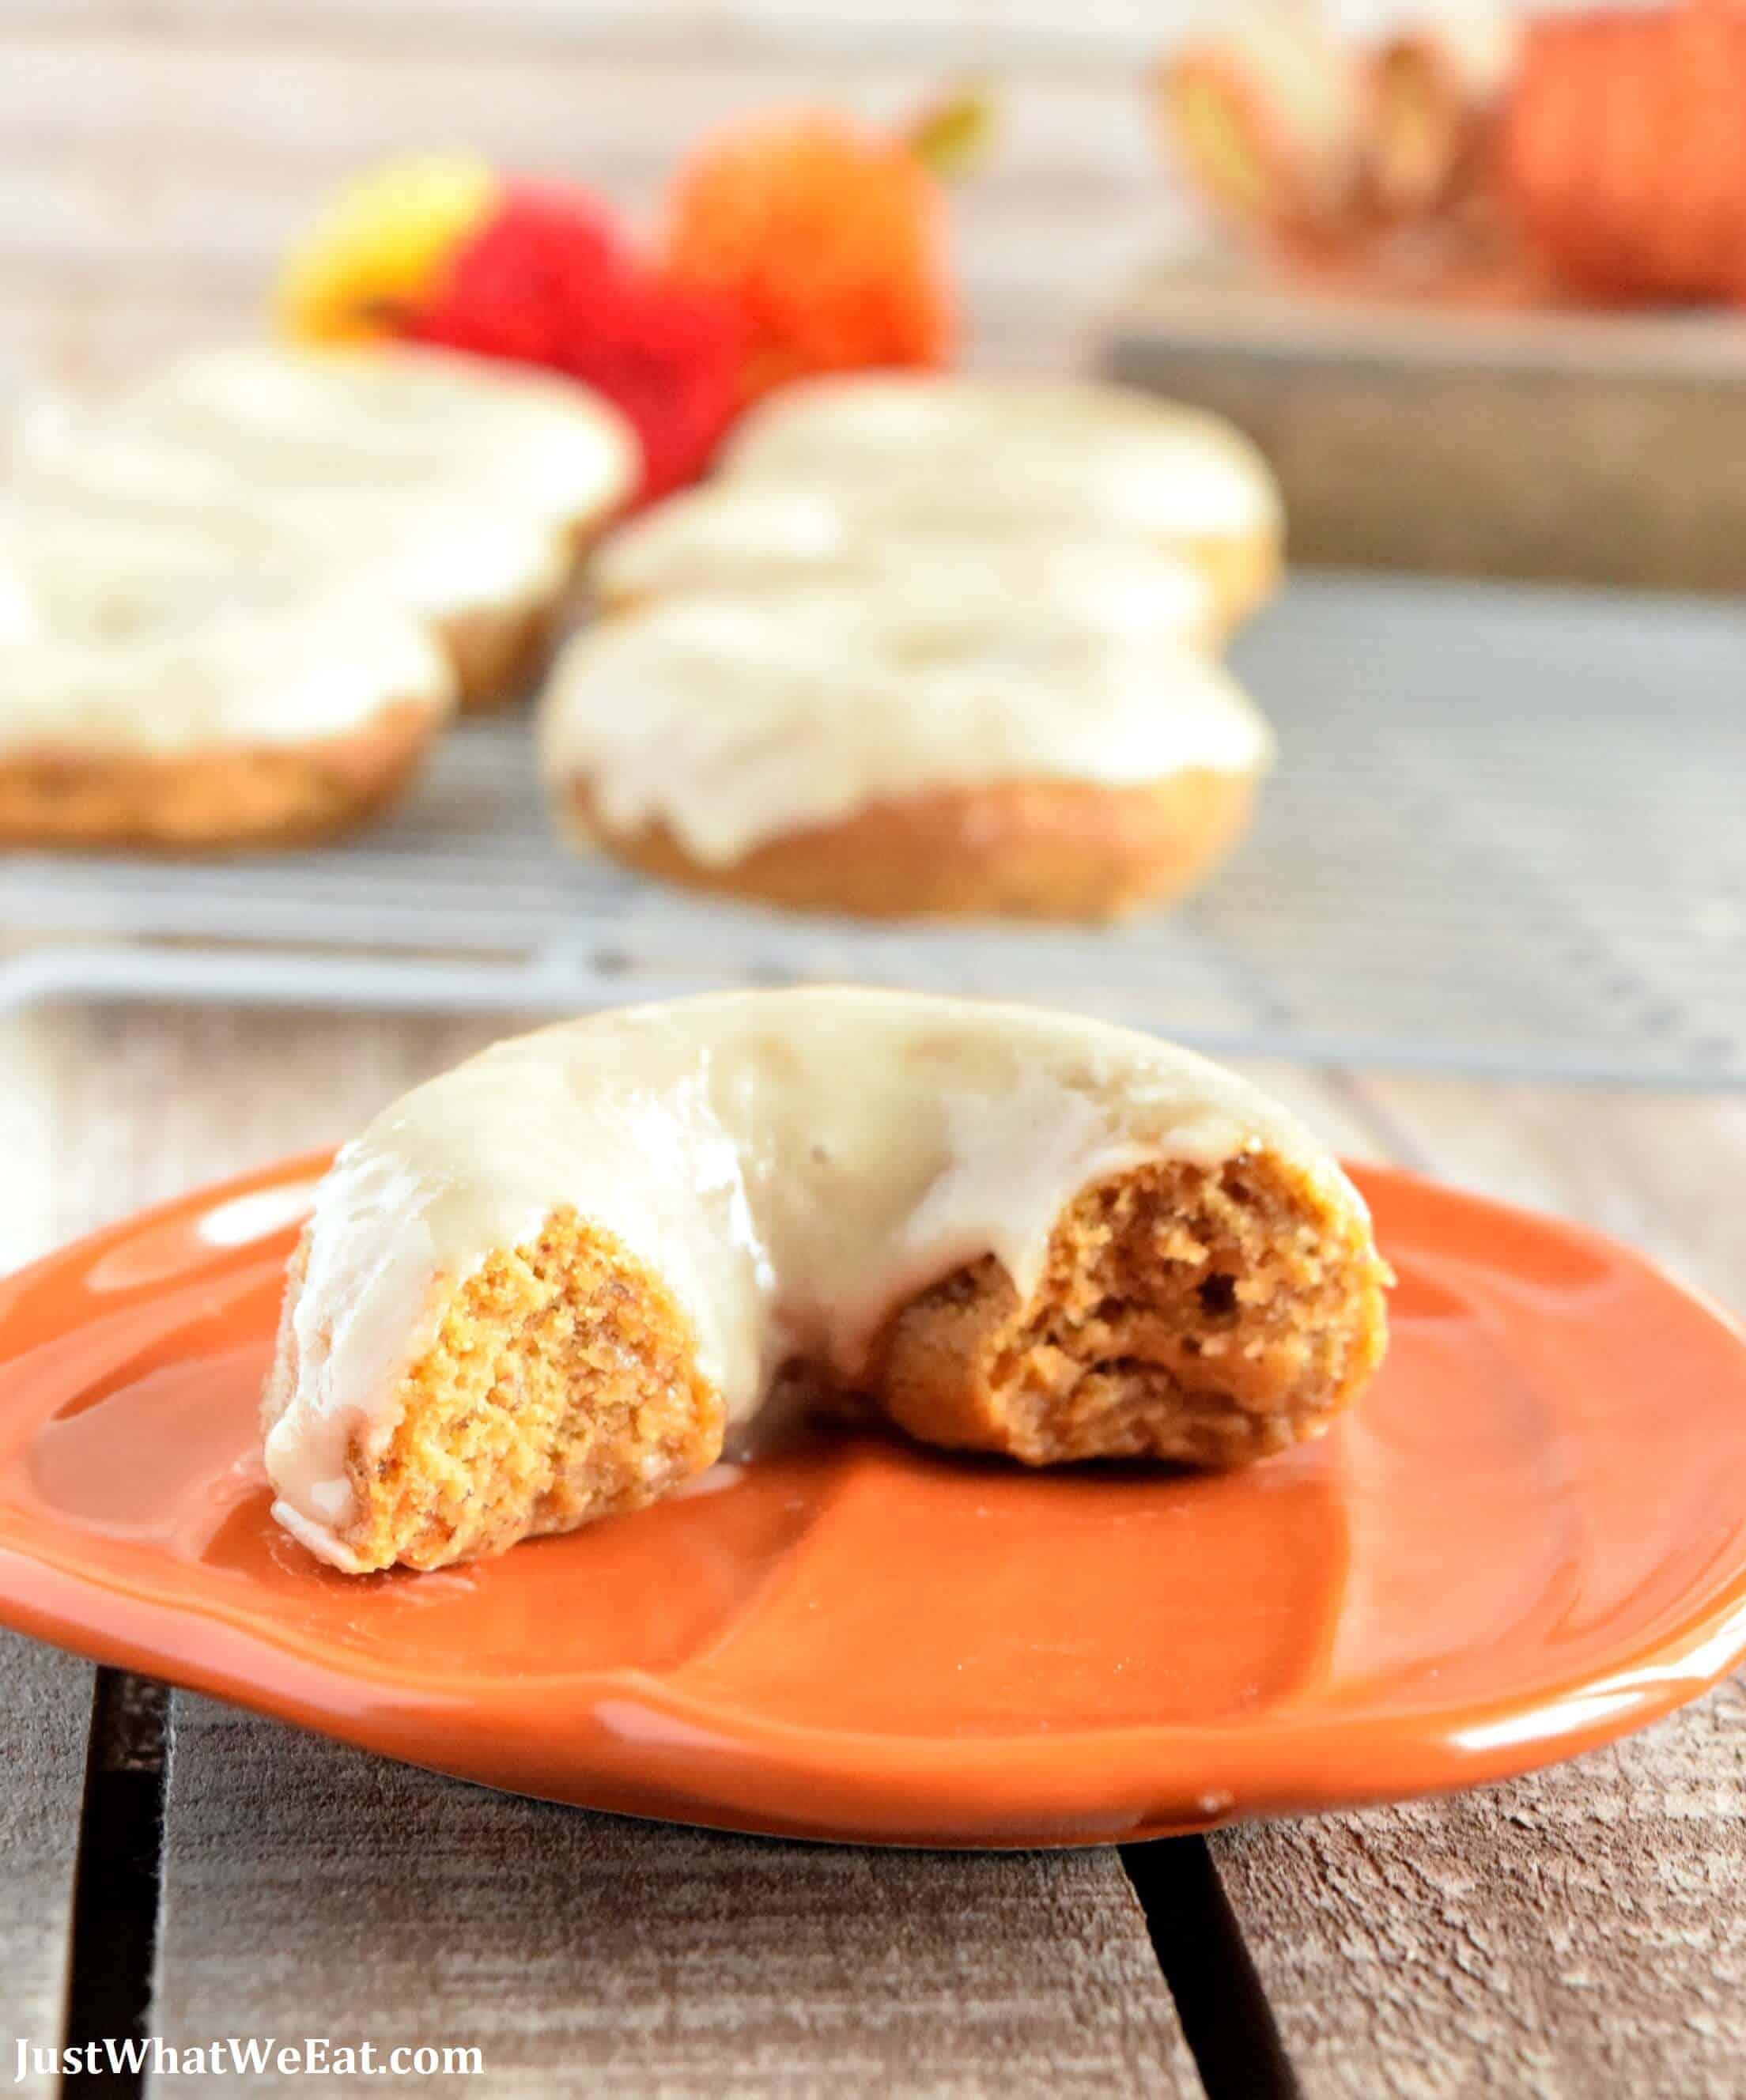 Pumpkin Donuts - Gluten Free, Vegan, & Refined Sugar Free